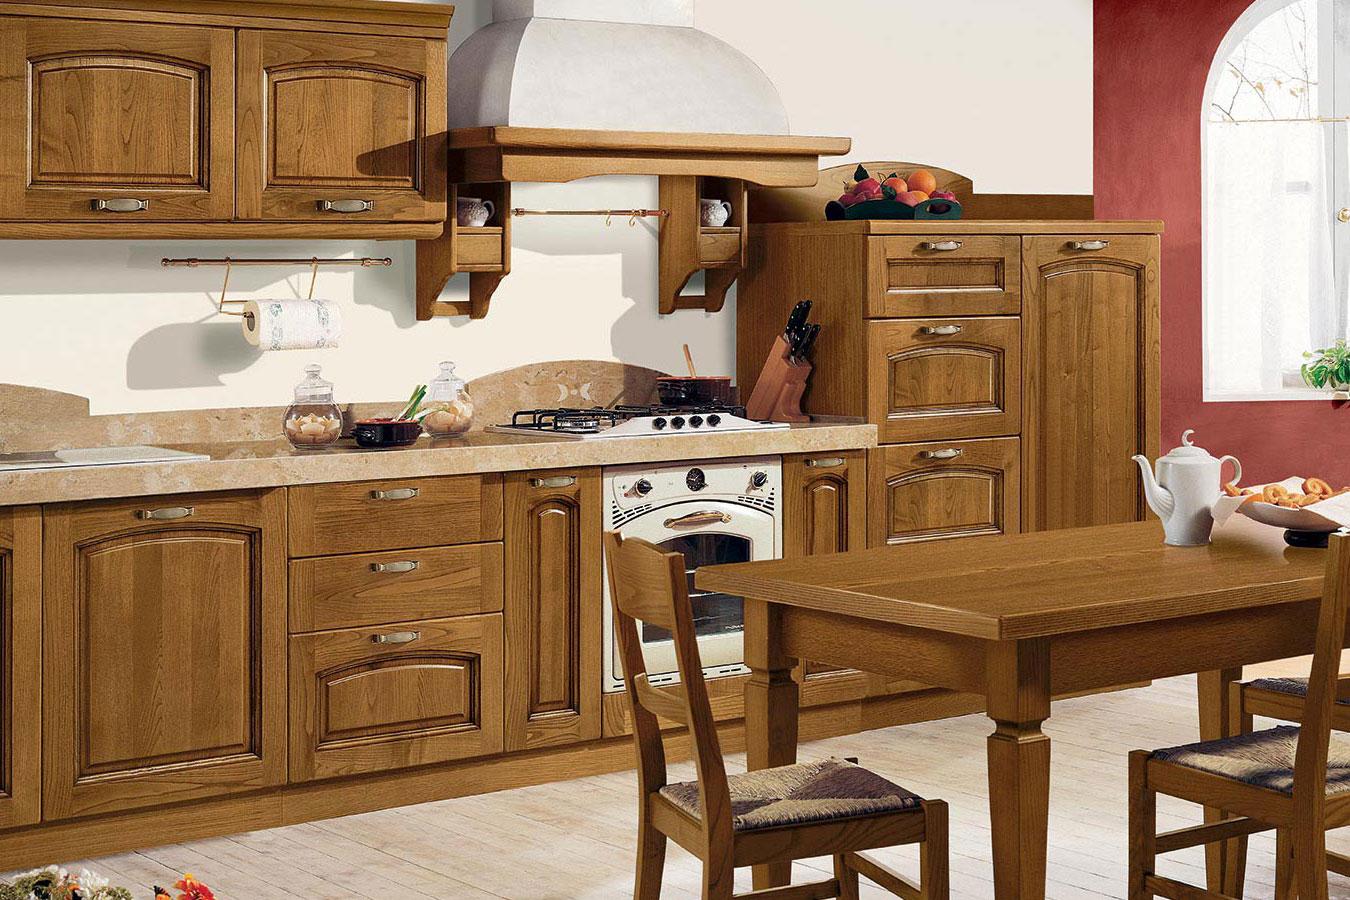 Cucina classica emma di arredo3 righetti mobili novara - Arredamento cucina classica ...